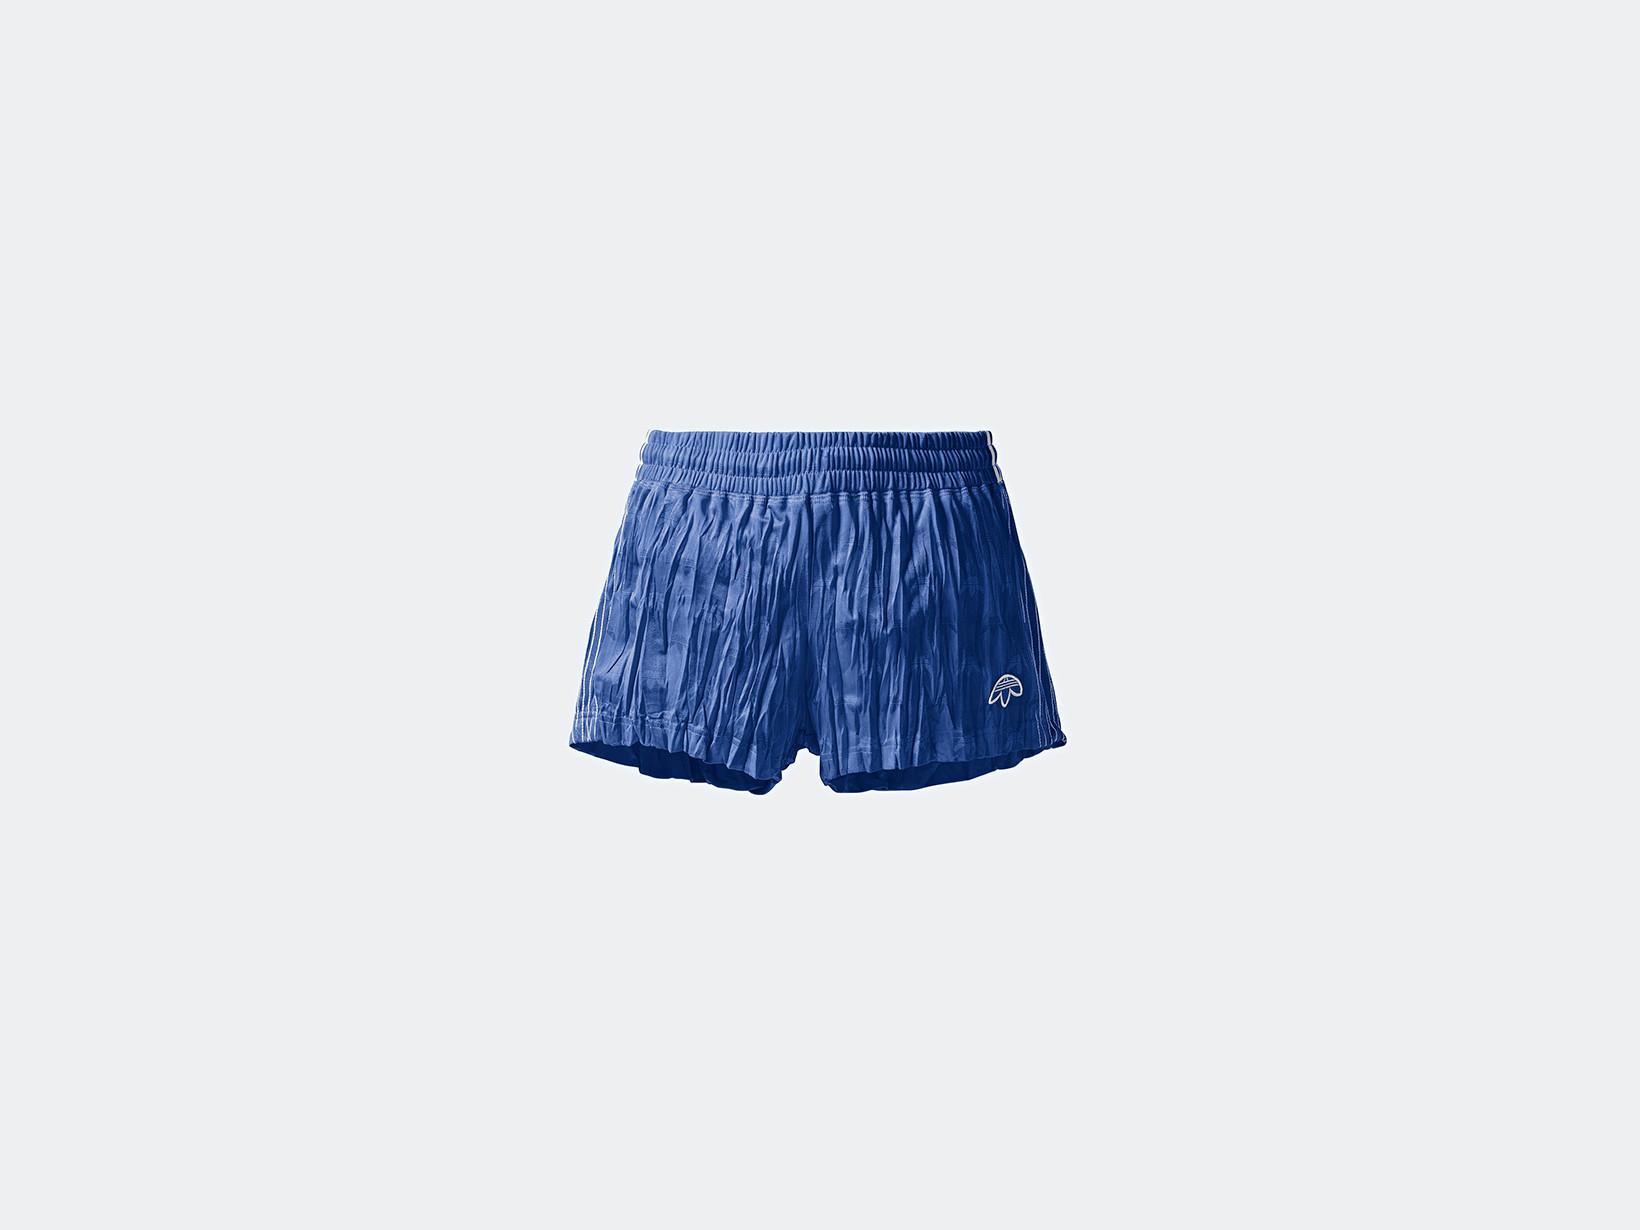 https---hypebeast.com-image-2018-06-adidas-originals-alexander-wang-season-3-drop-3-24